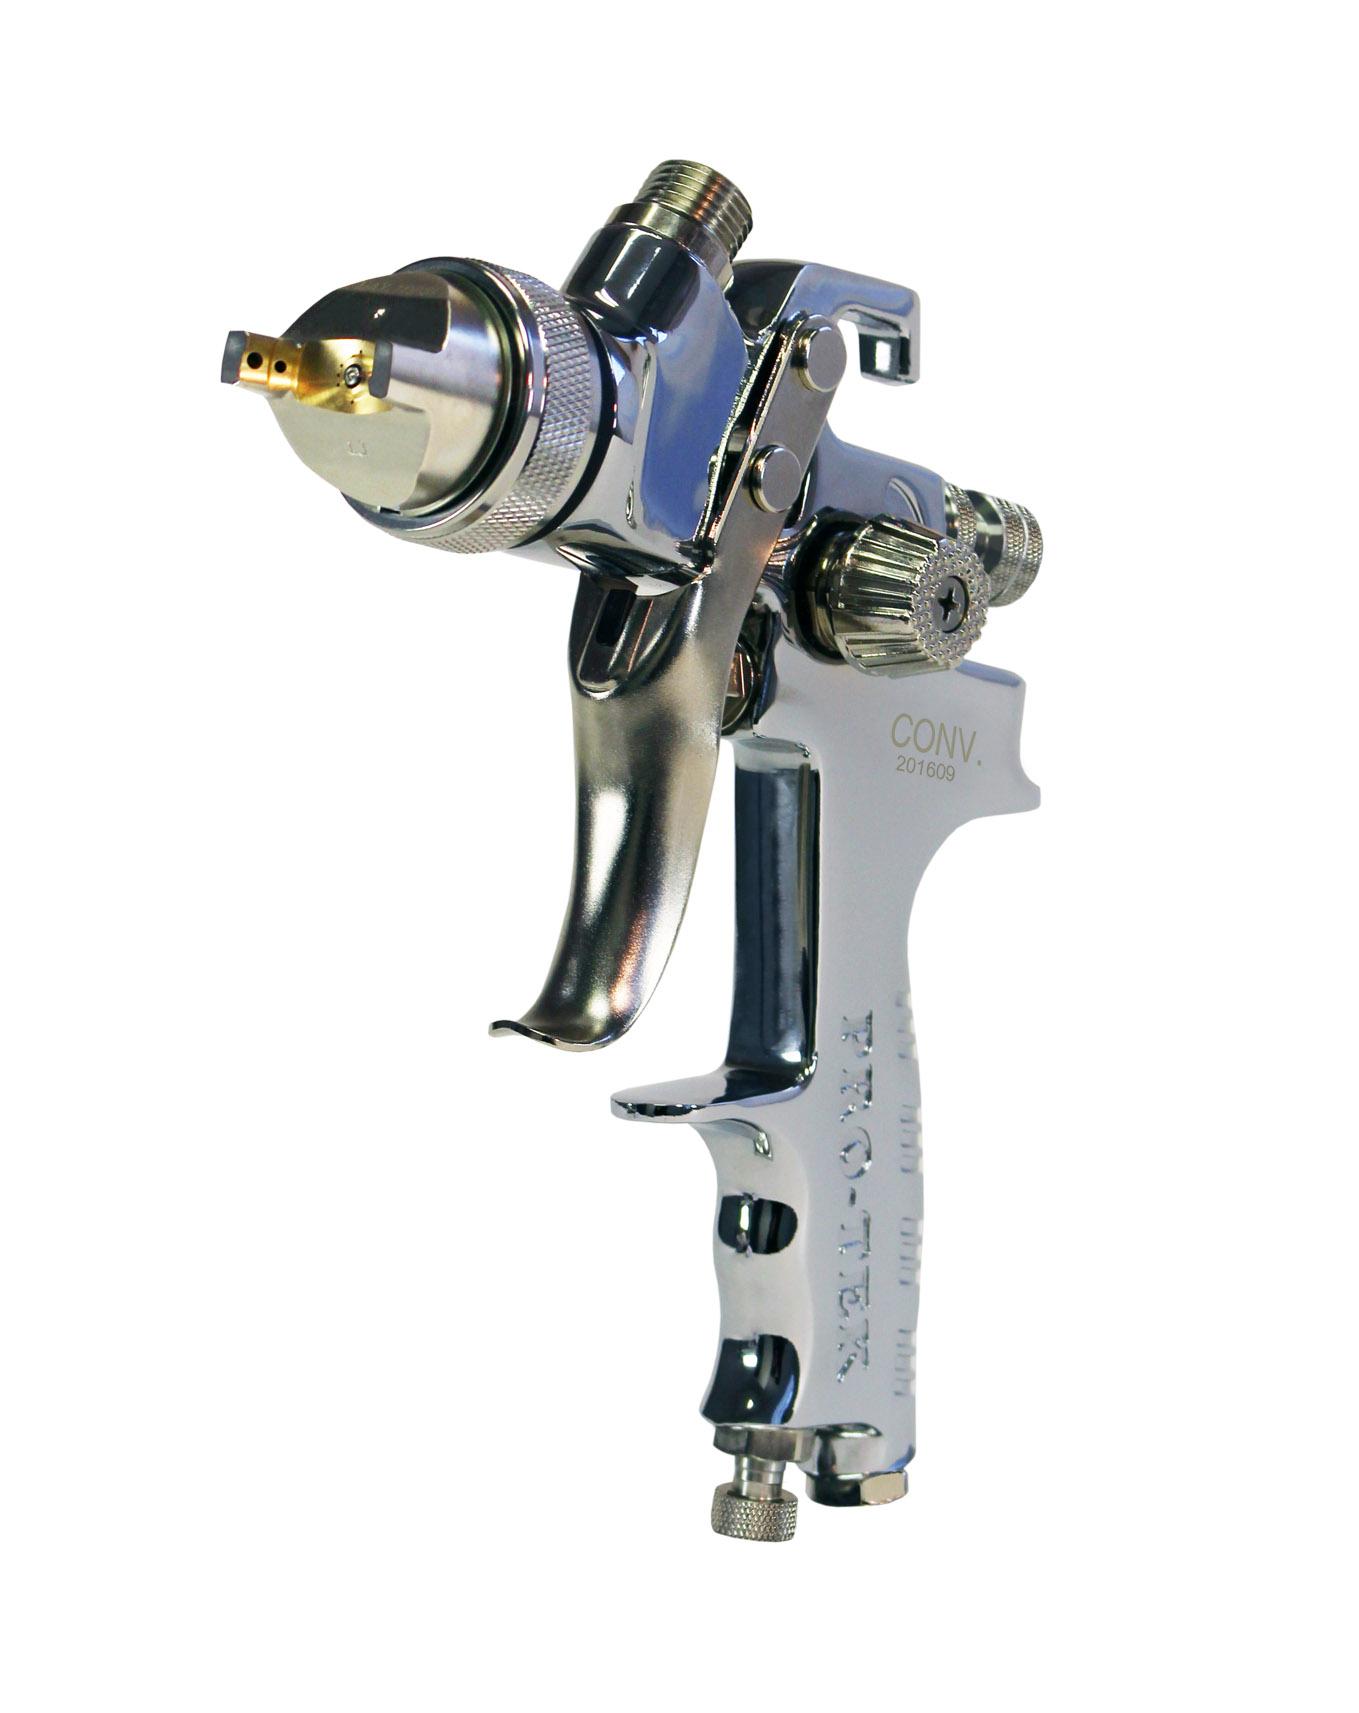 Pro Tek 2660 Hvlp Gravity Spray Gun